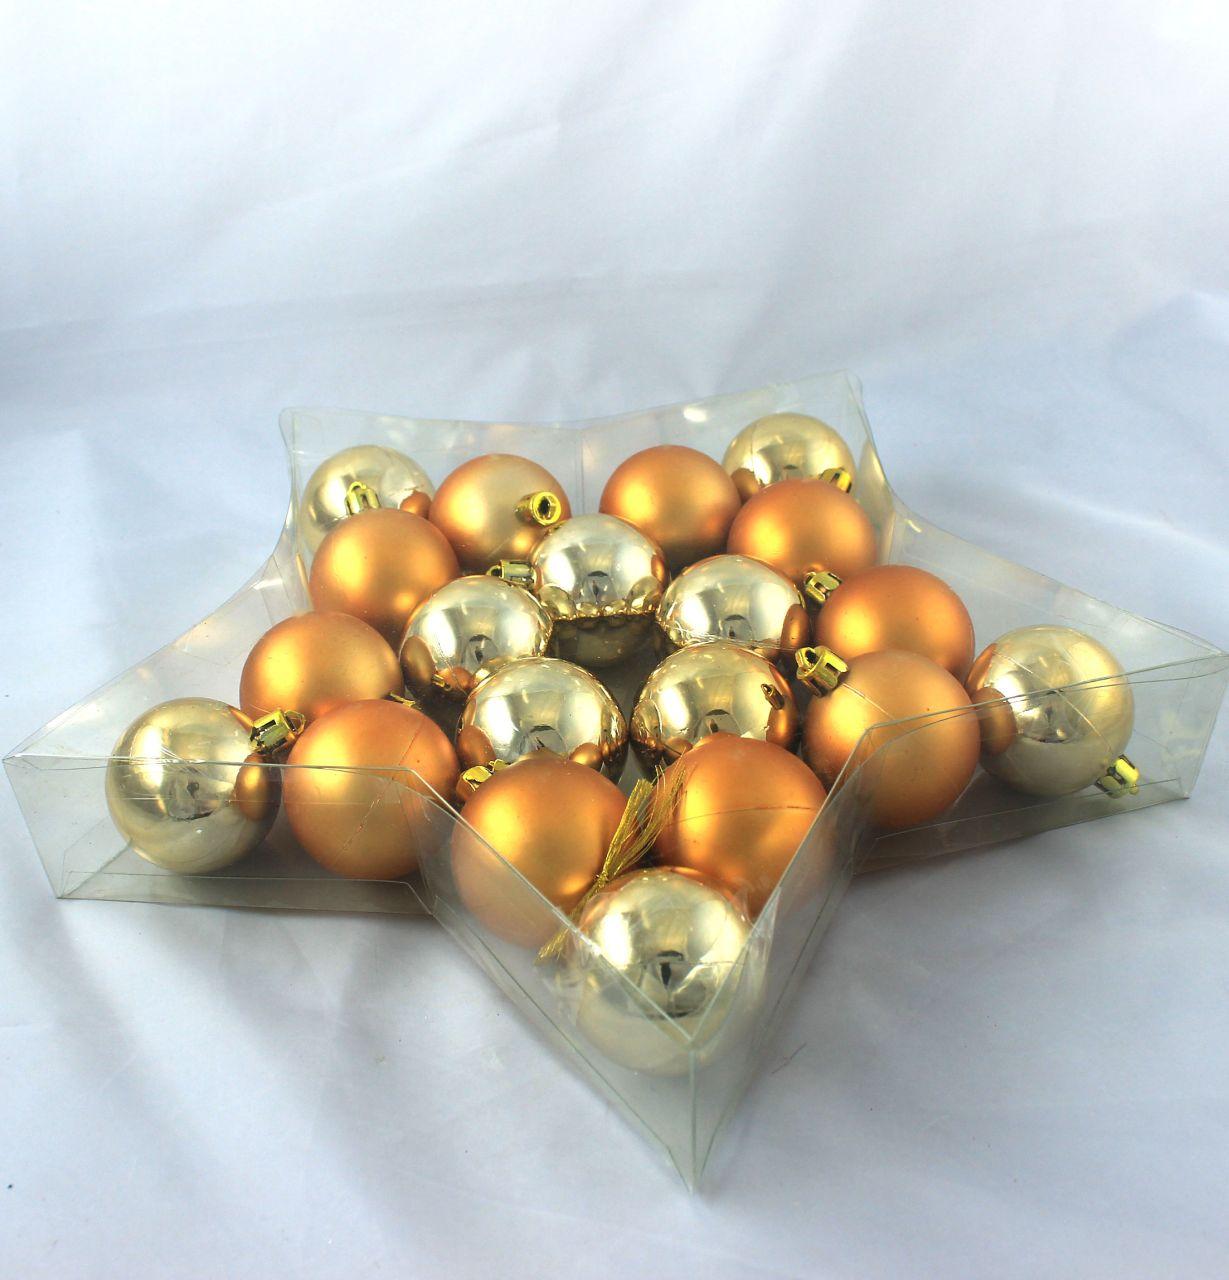 weihnachtskugel plastik 5cm gold 20st preiswert online kaufen. Black Bedroom Furniture Sets. Home Design Ideas